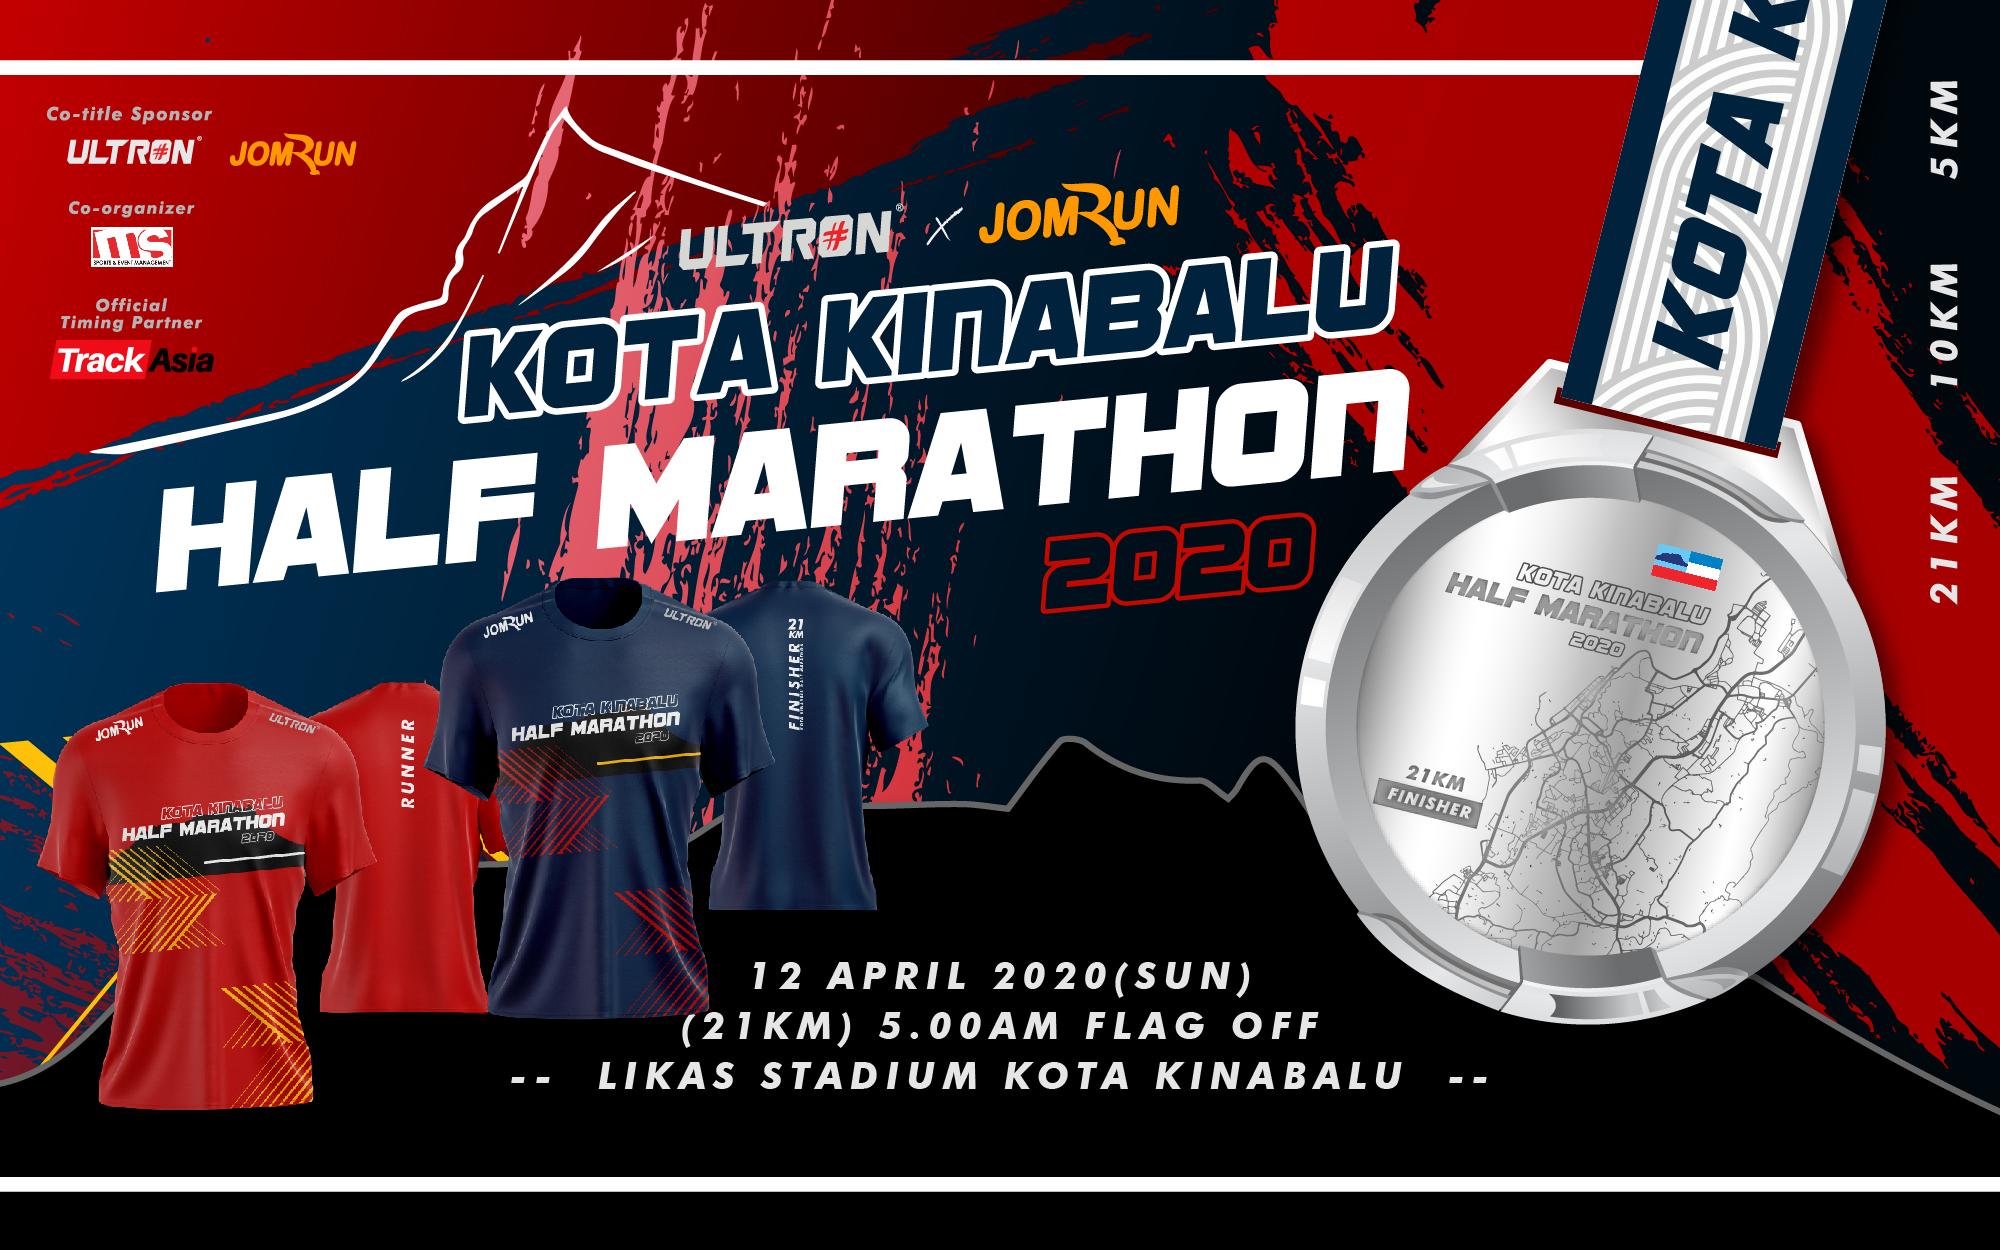 Kota Kinabalu Half Marathon 2020 (Event cancelled)